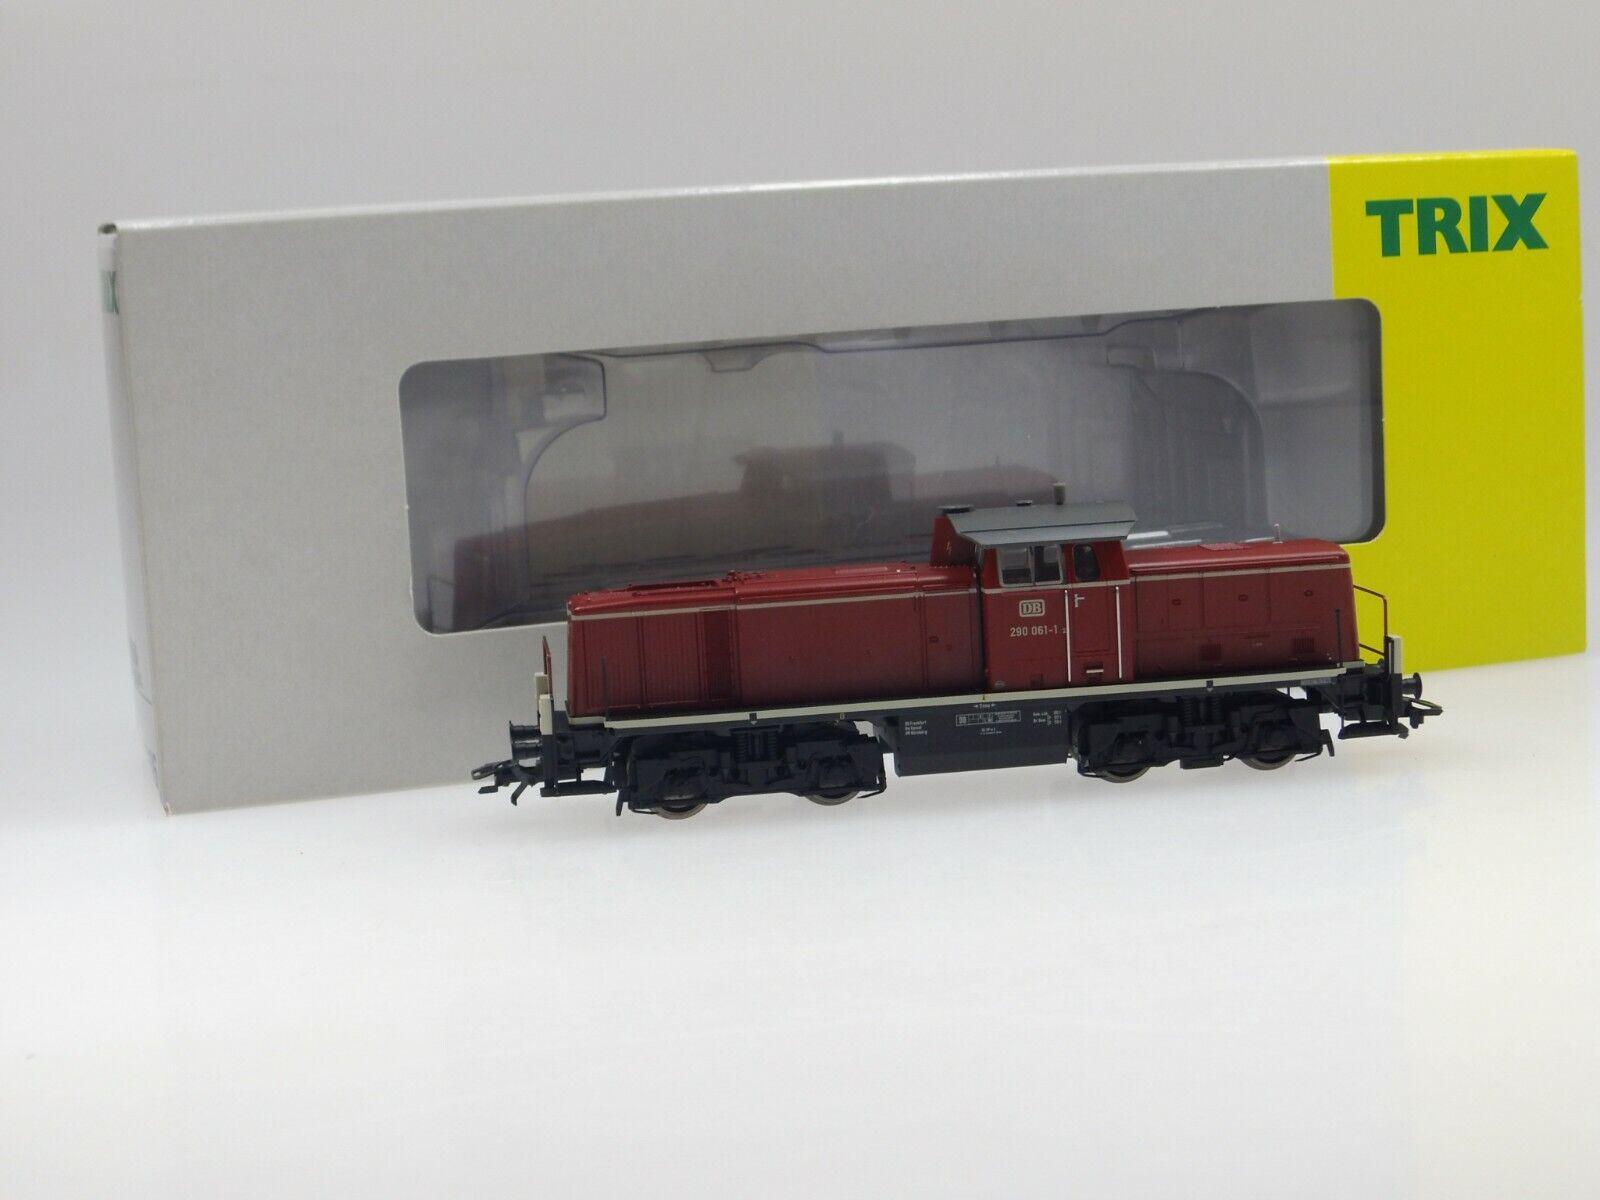 (87 509) Trix H0 Diesellok BR 290 061-1 DB (Art.-Nr.22206)DC digital